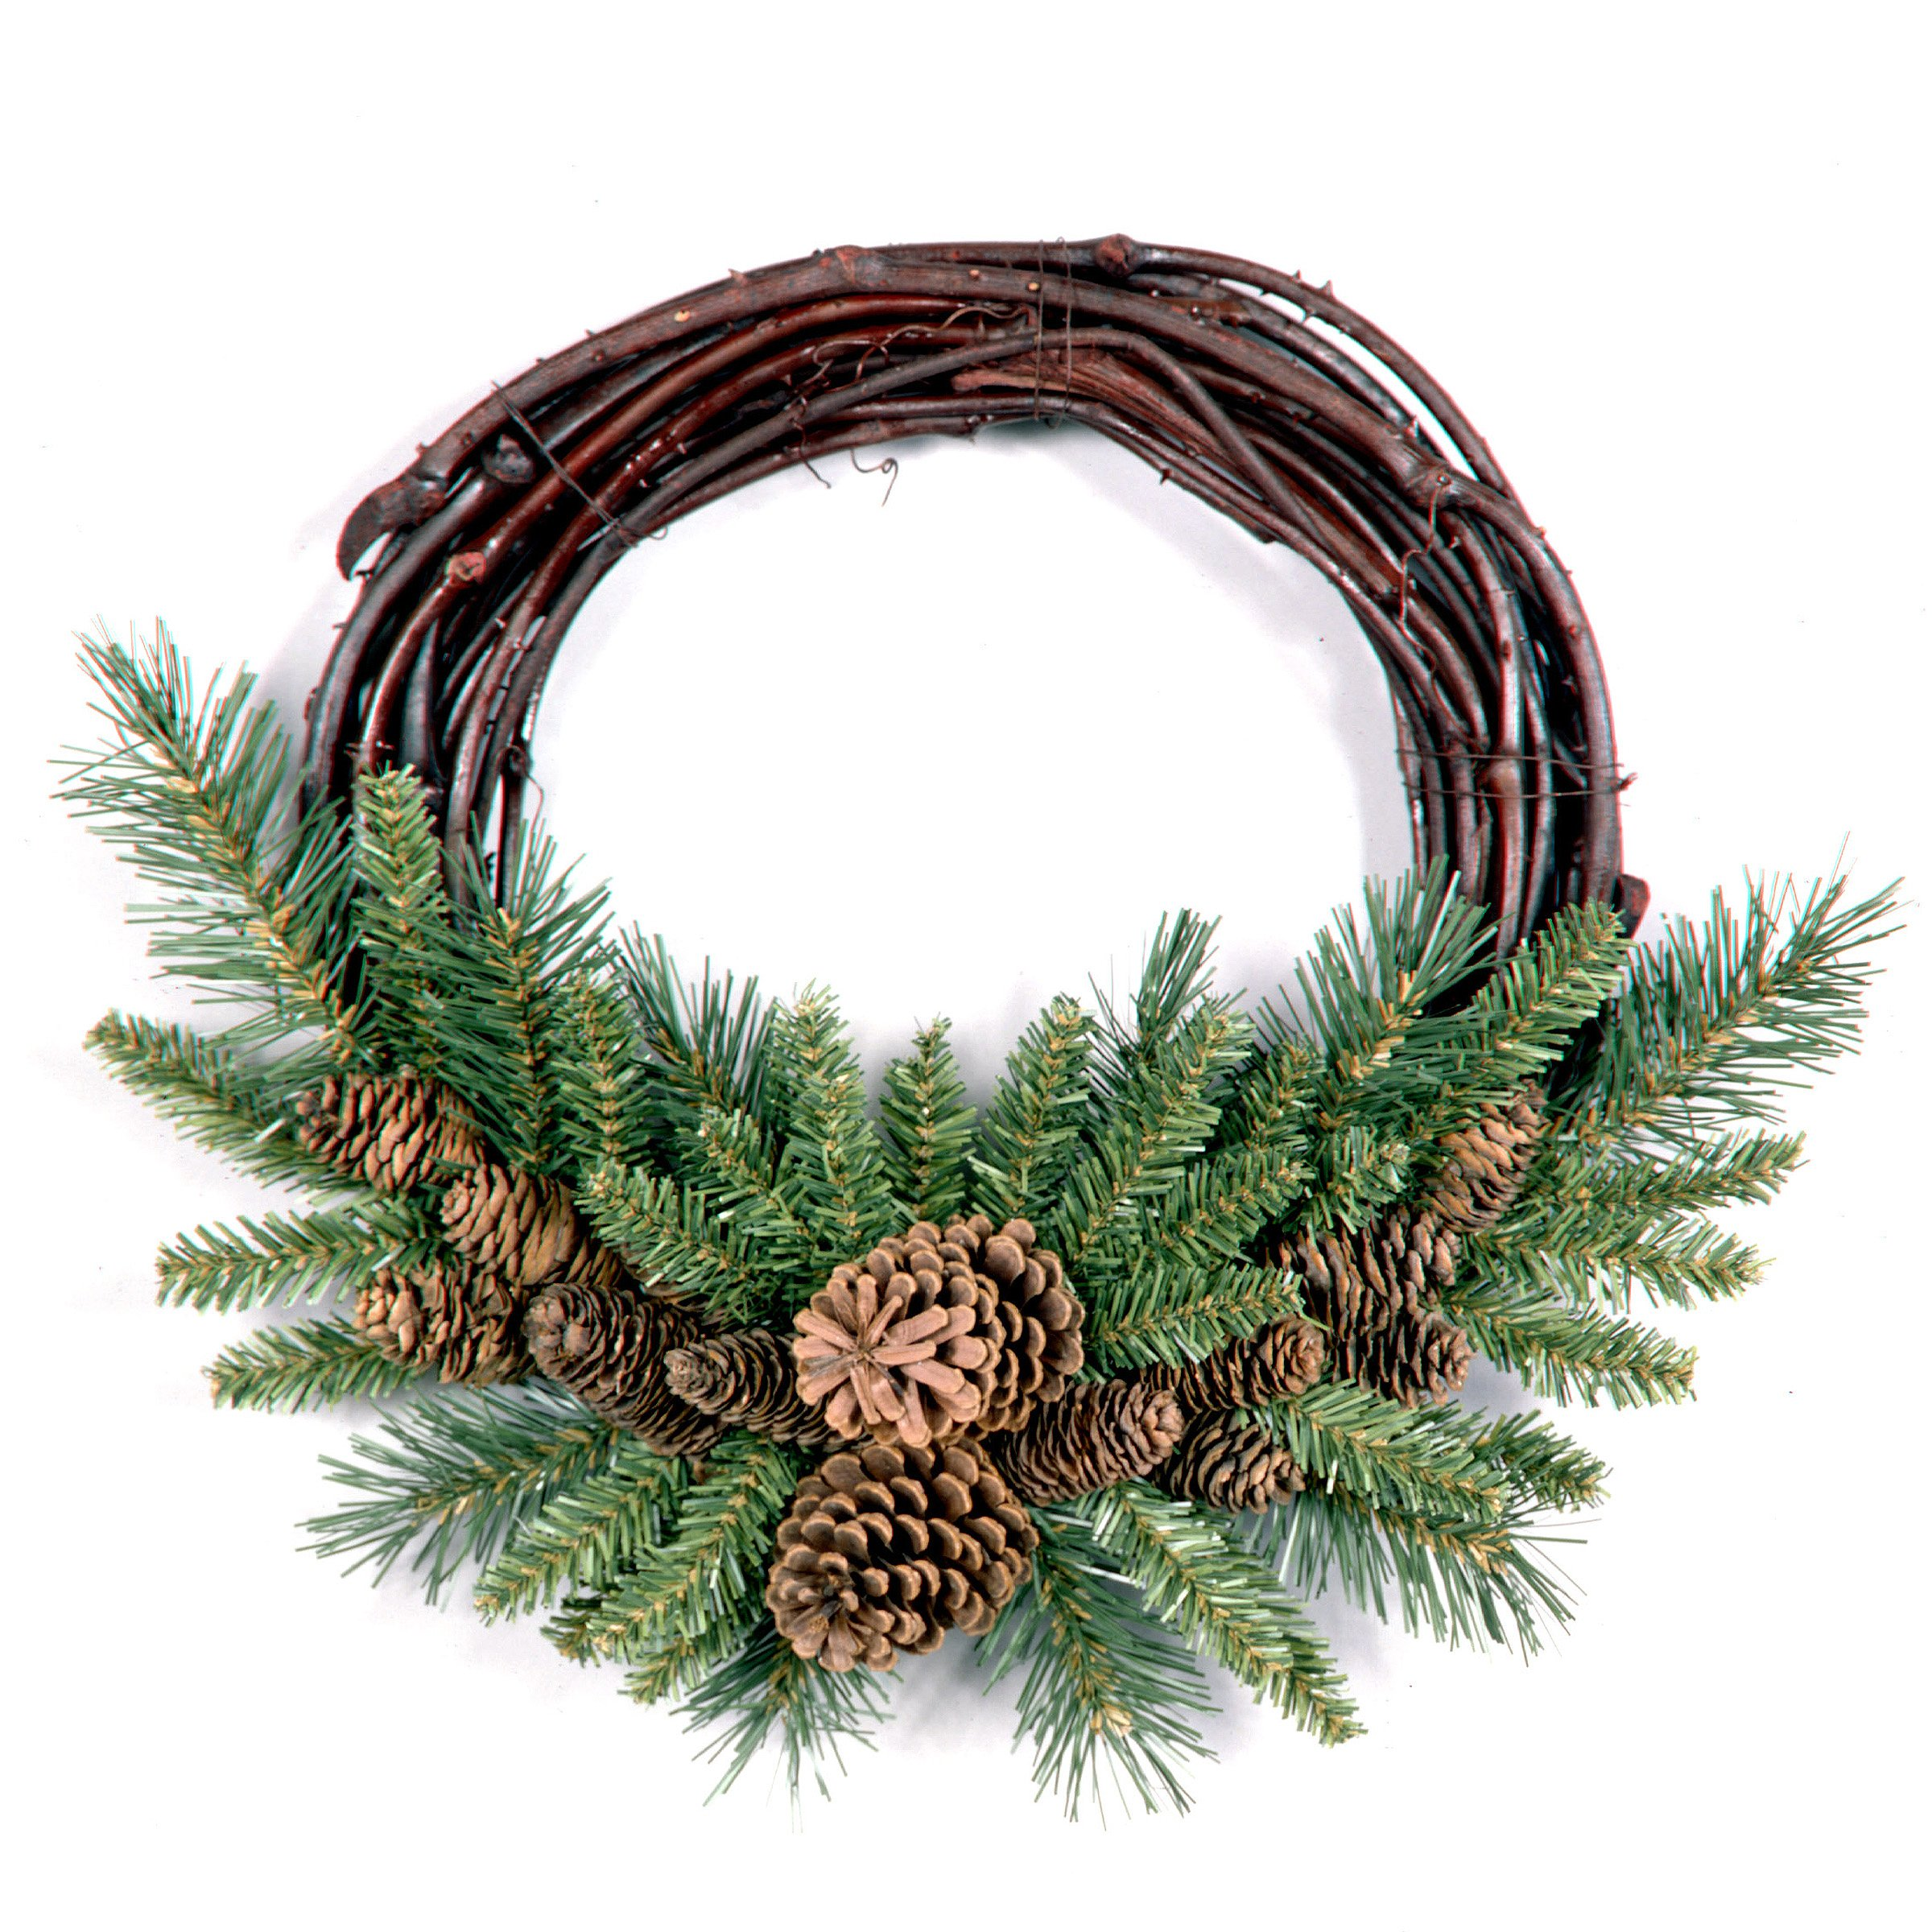 National Tree 16 Inch Pine Cone Grapevine Wreath (PC-16GV)